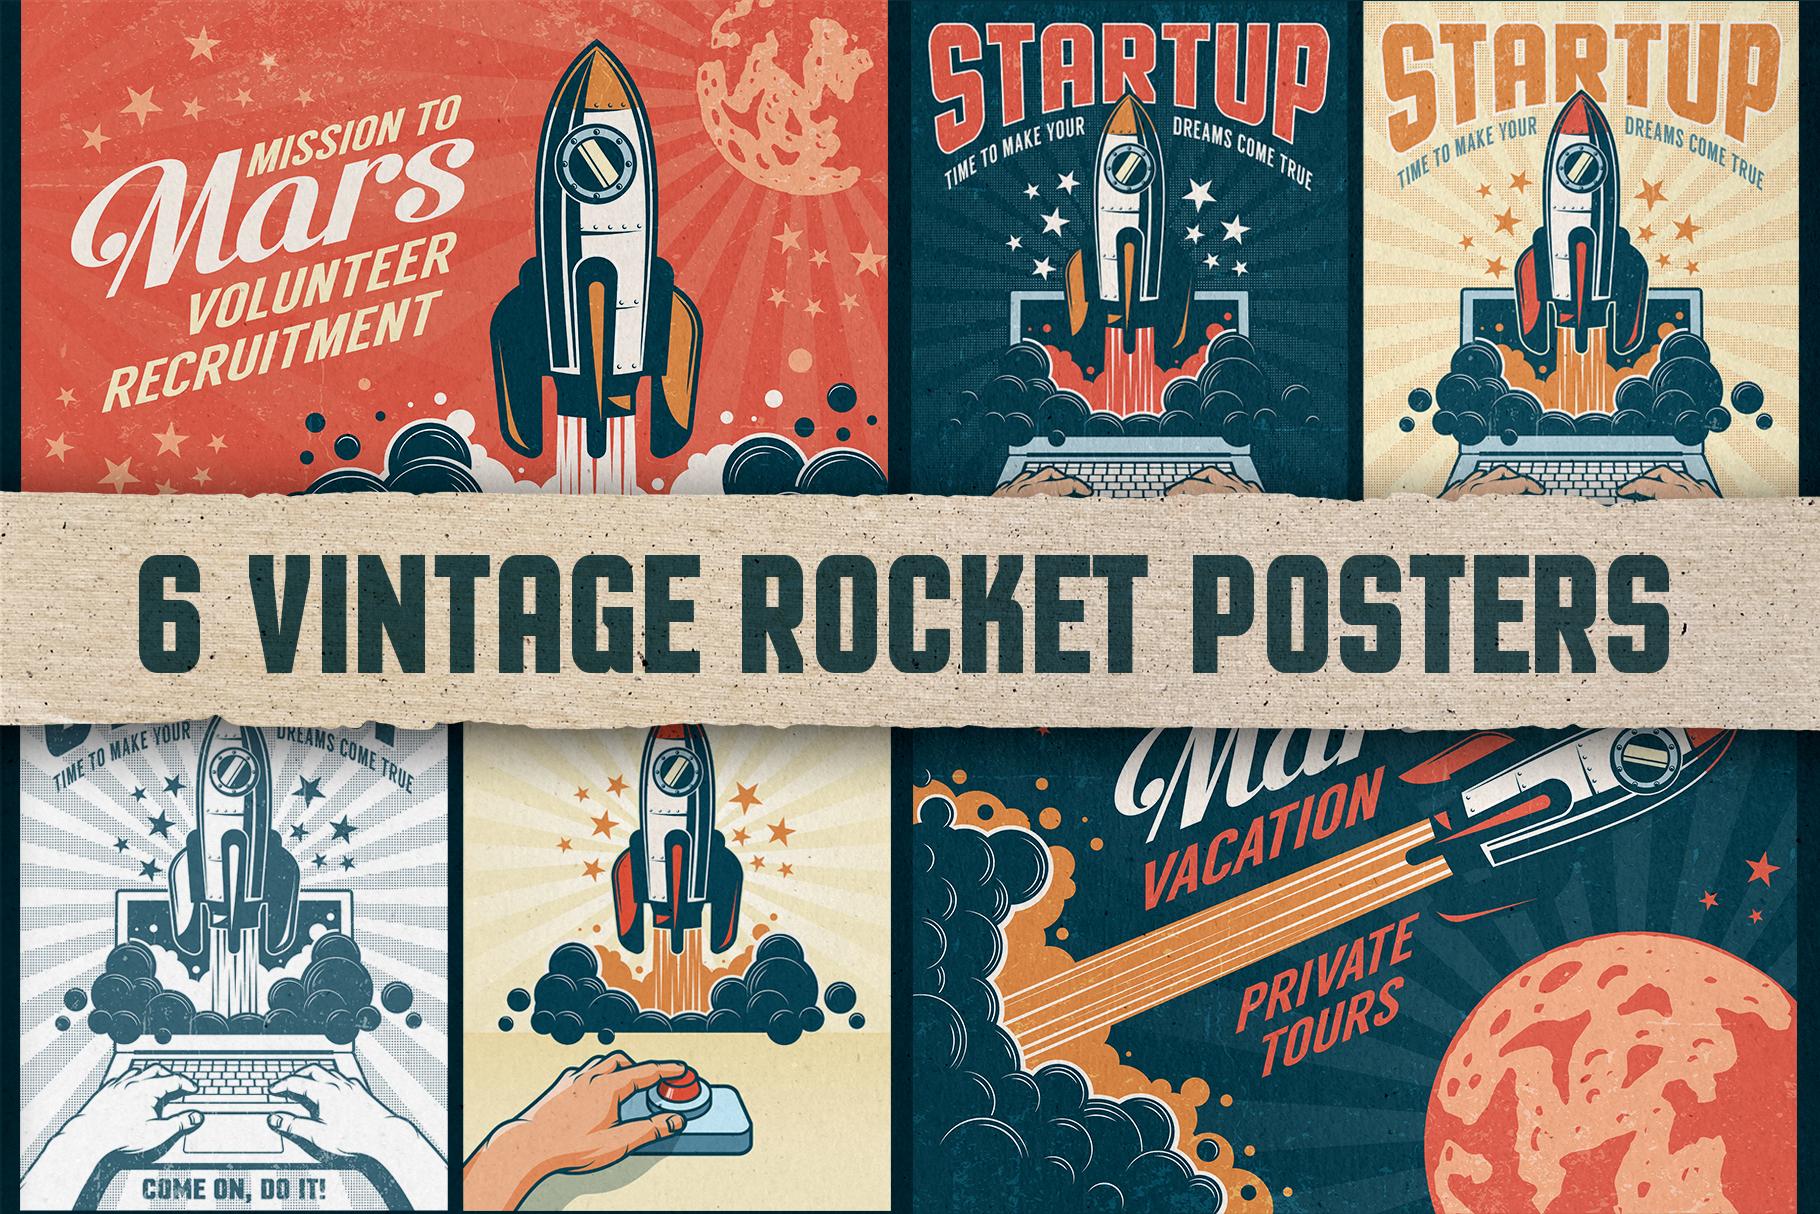 6 Vintage Rocket Posters example image 1